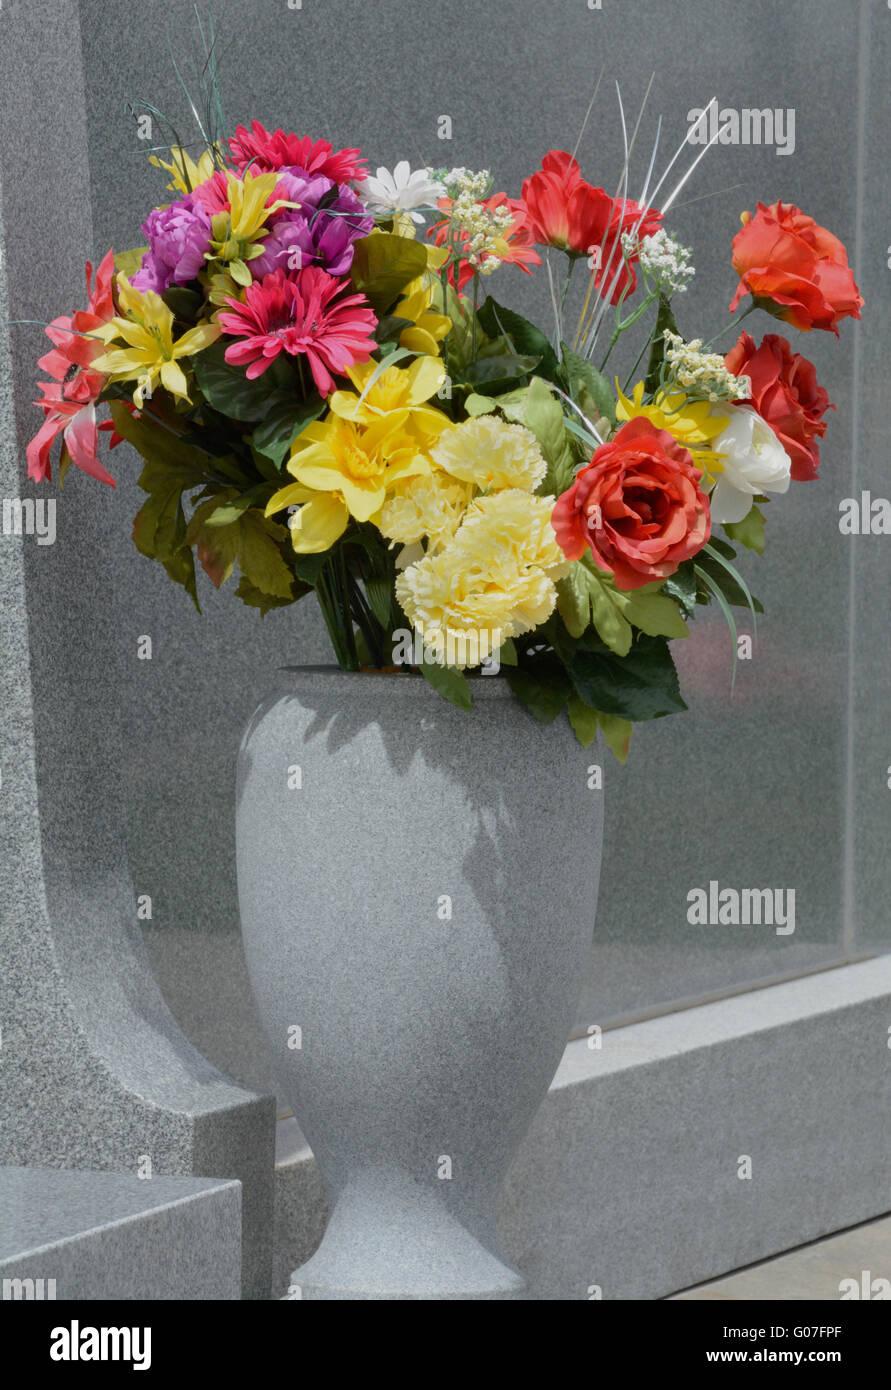 Flowers Grave Vase Stock Photos Flowers Grave Vase Stock Images